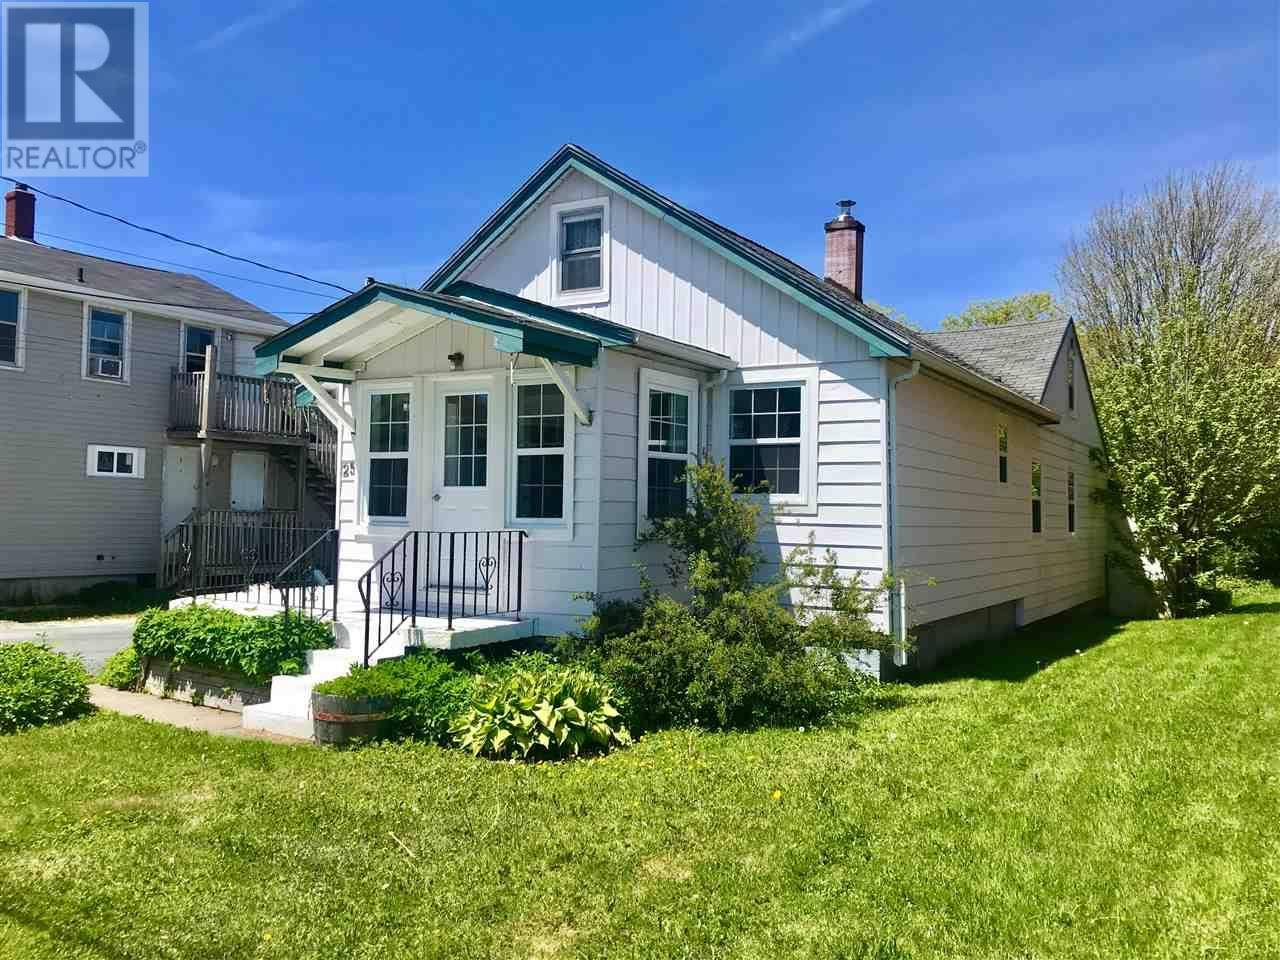 Home for sale at 25 Albro Lake Rd Dartmouth Nova Scotia - MLS: 201918246